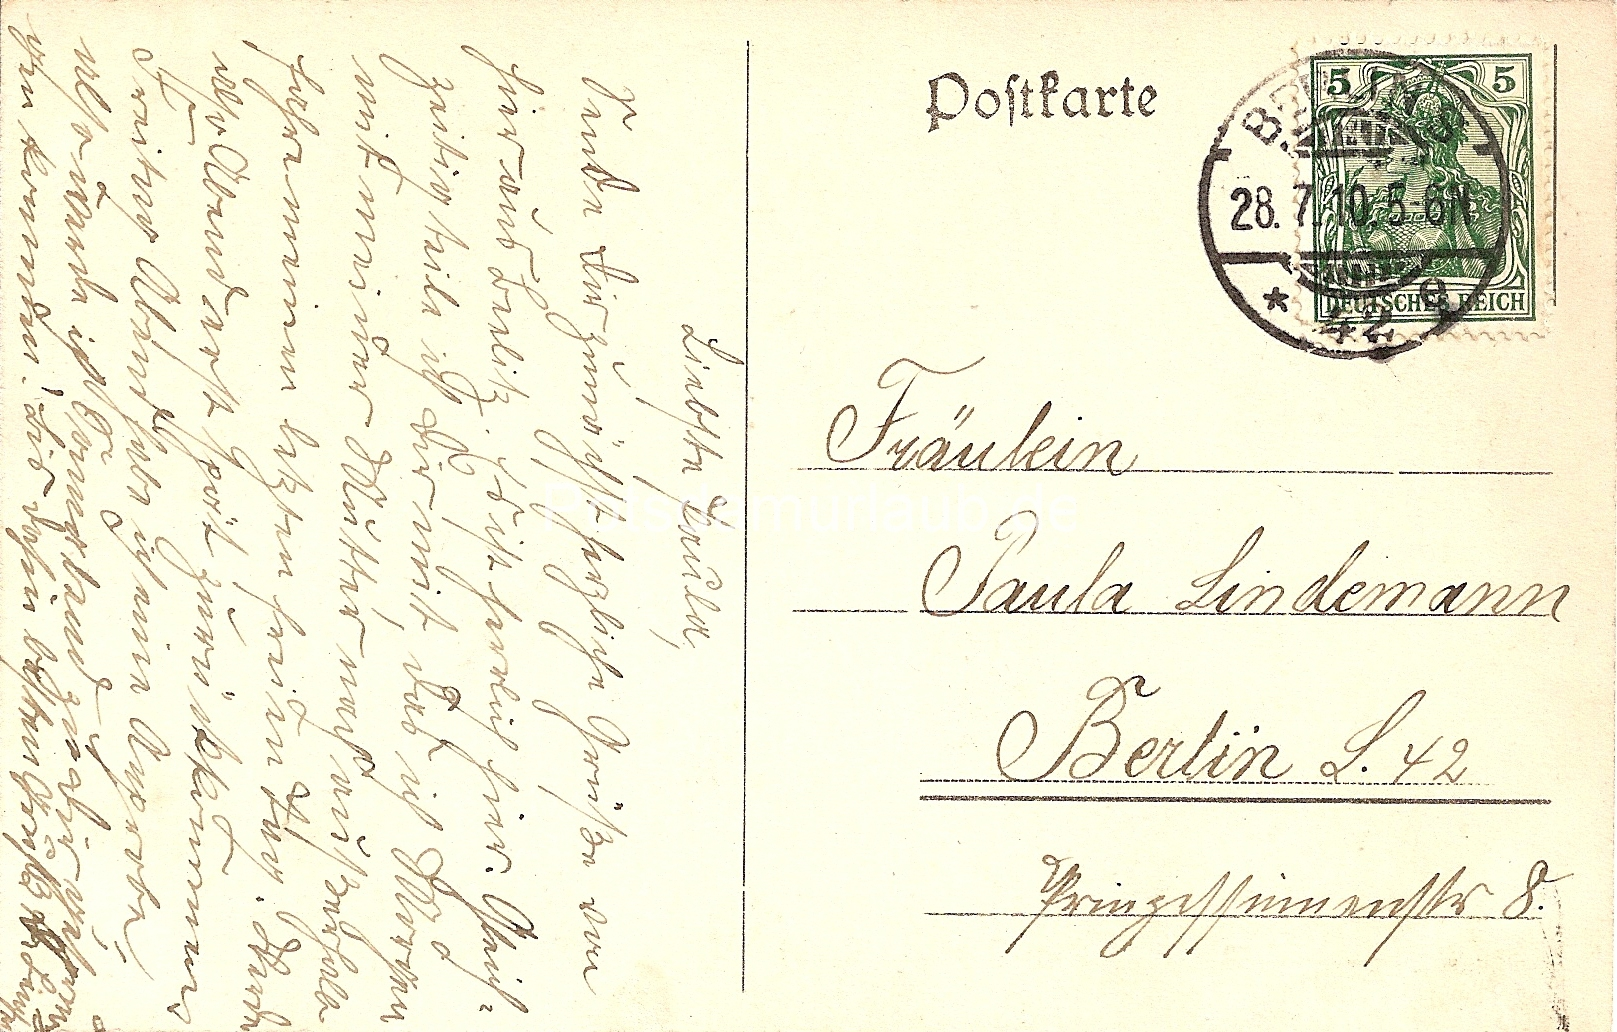 1910 07 28